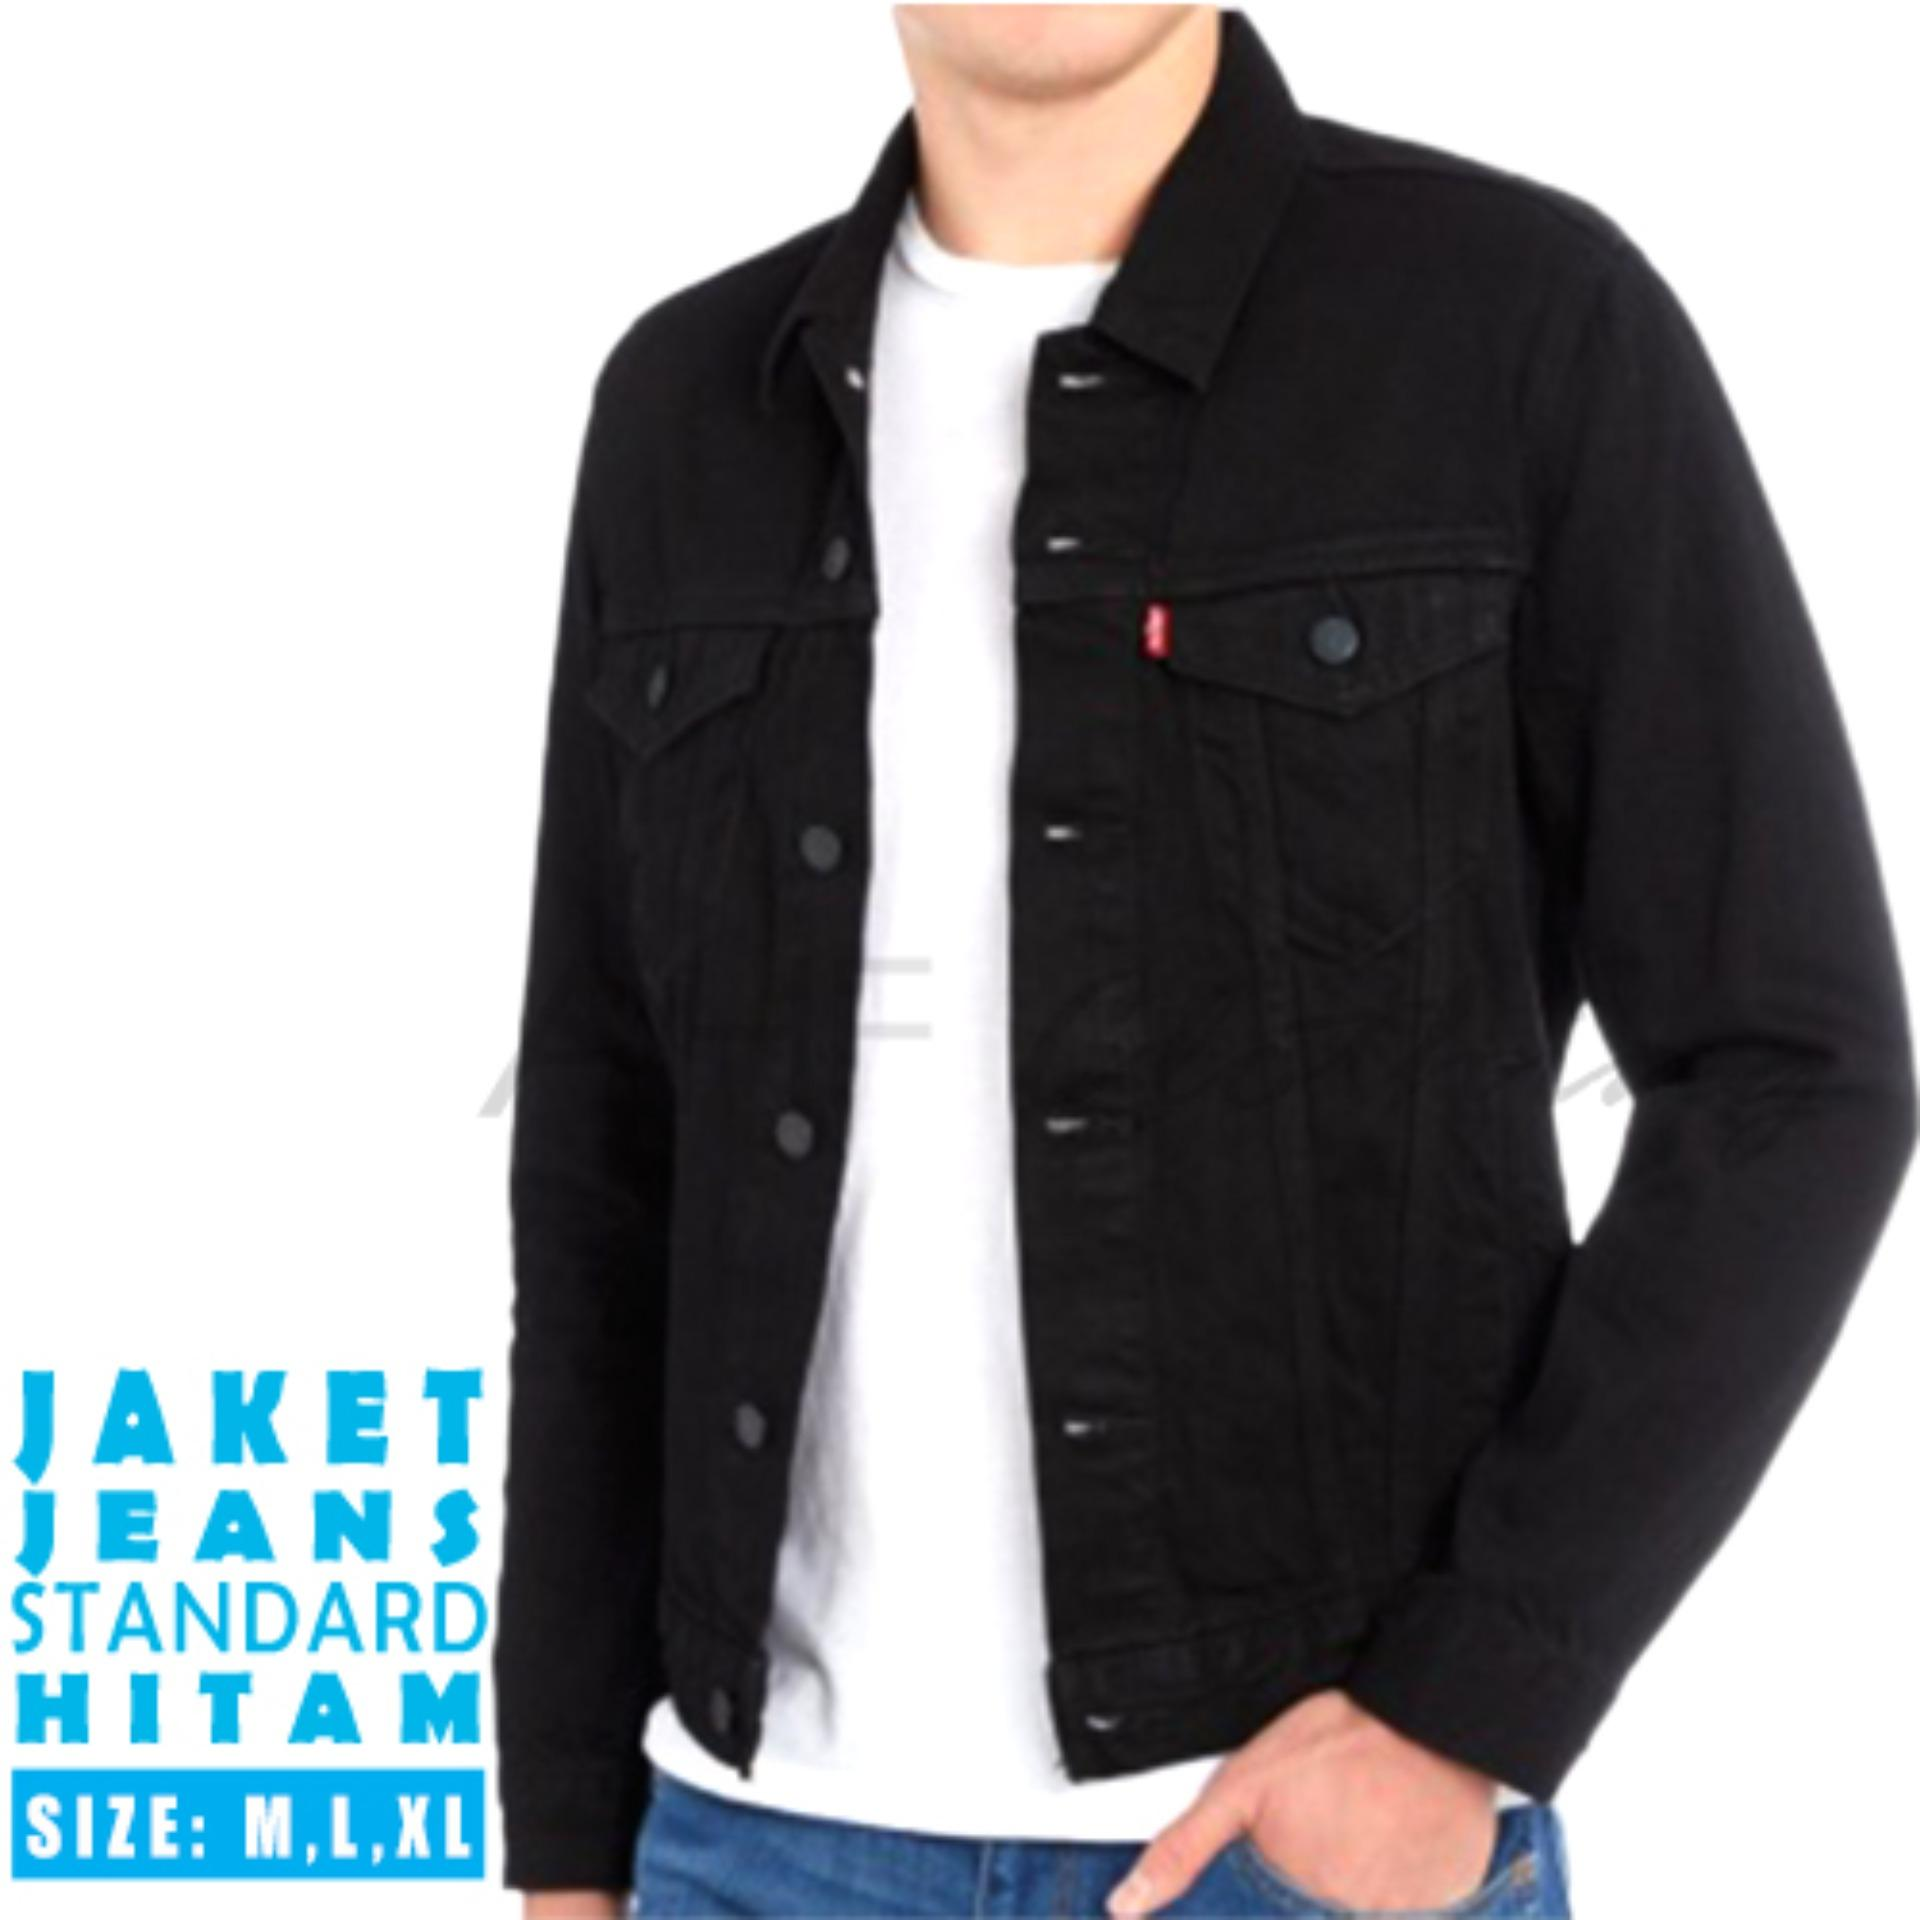 AHF Jaket Jeans Denim Pria - Hitam a7a66d9afd